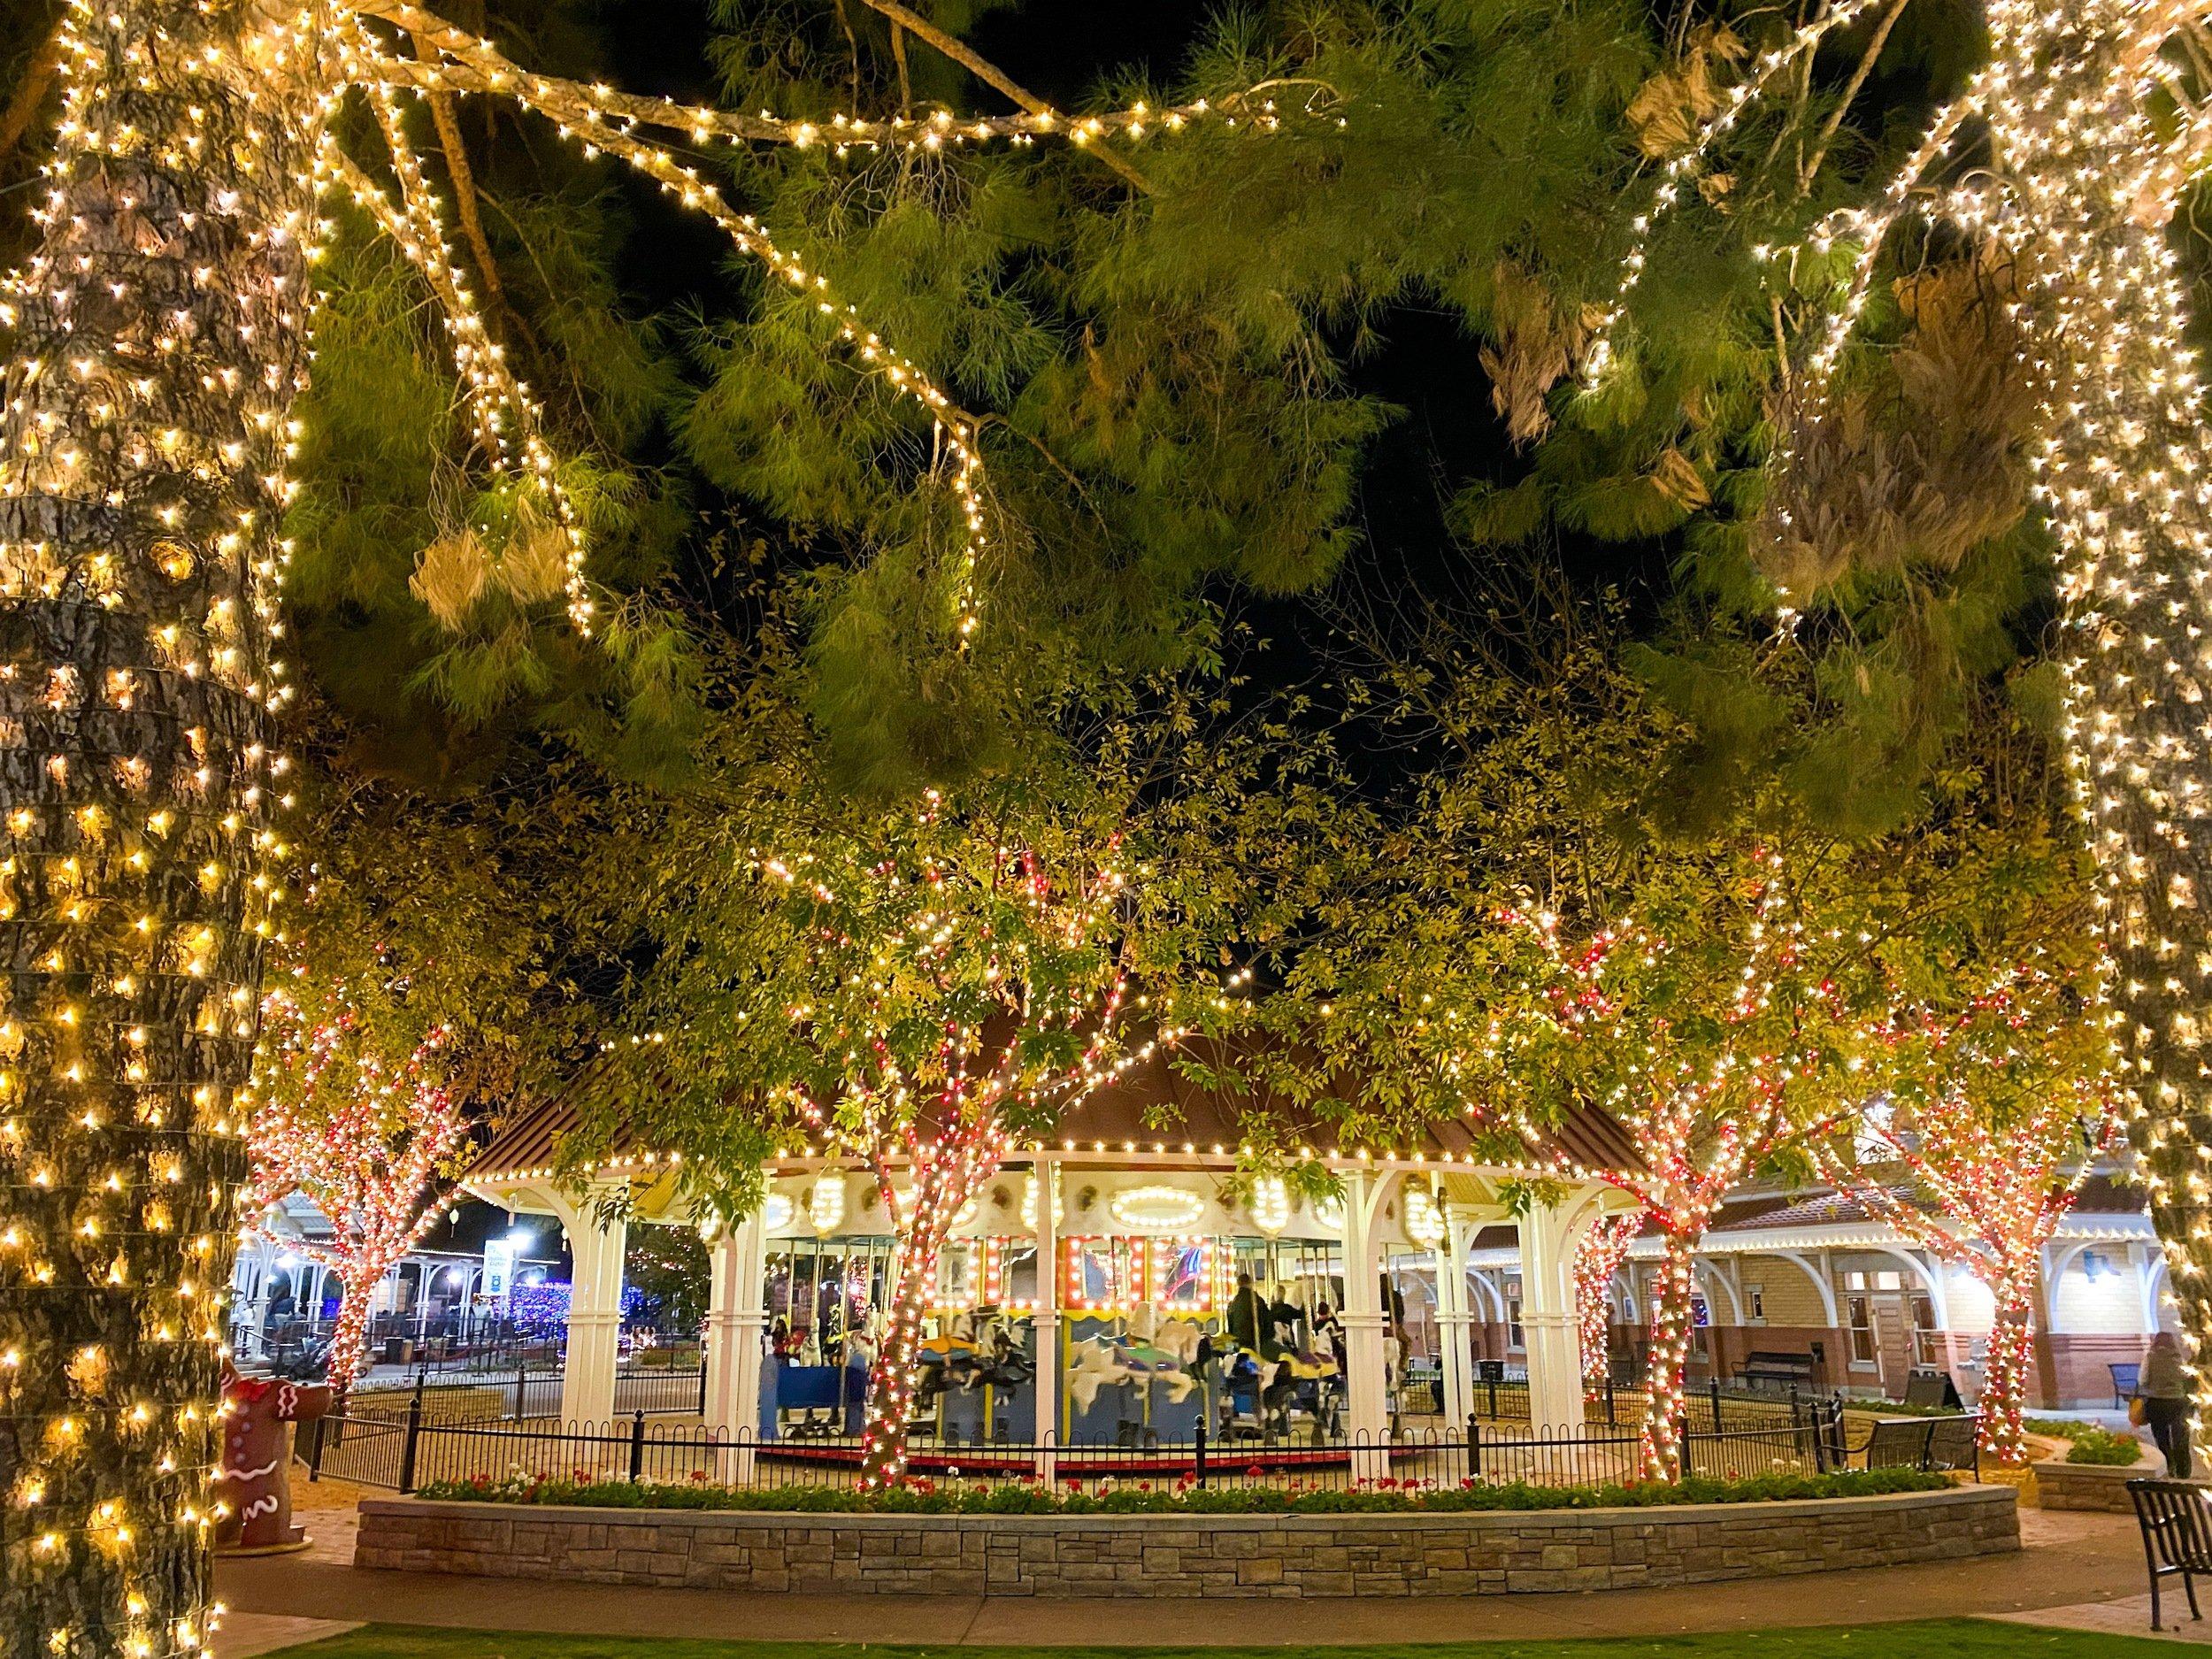 The Charro Carousel at Scottsdale's McCormick-Stillman Railroad Park